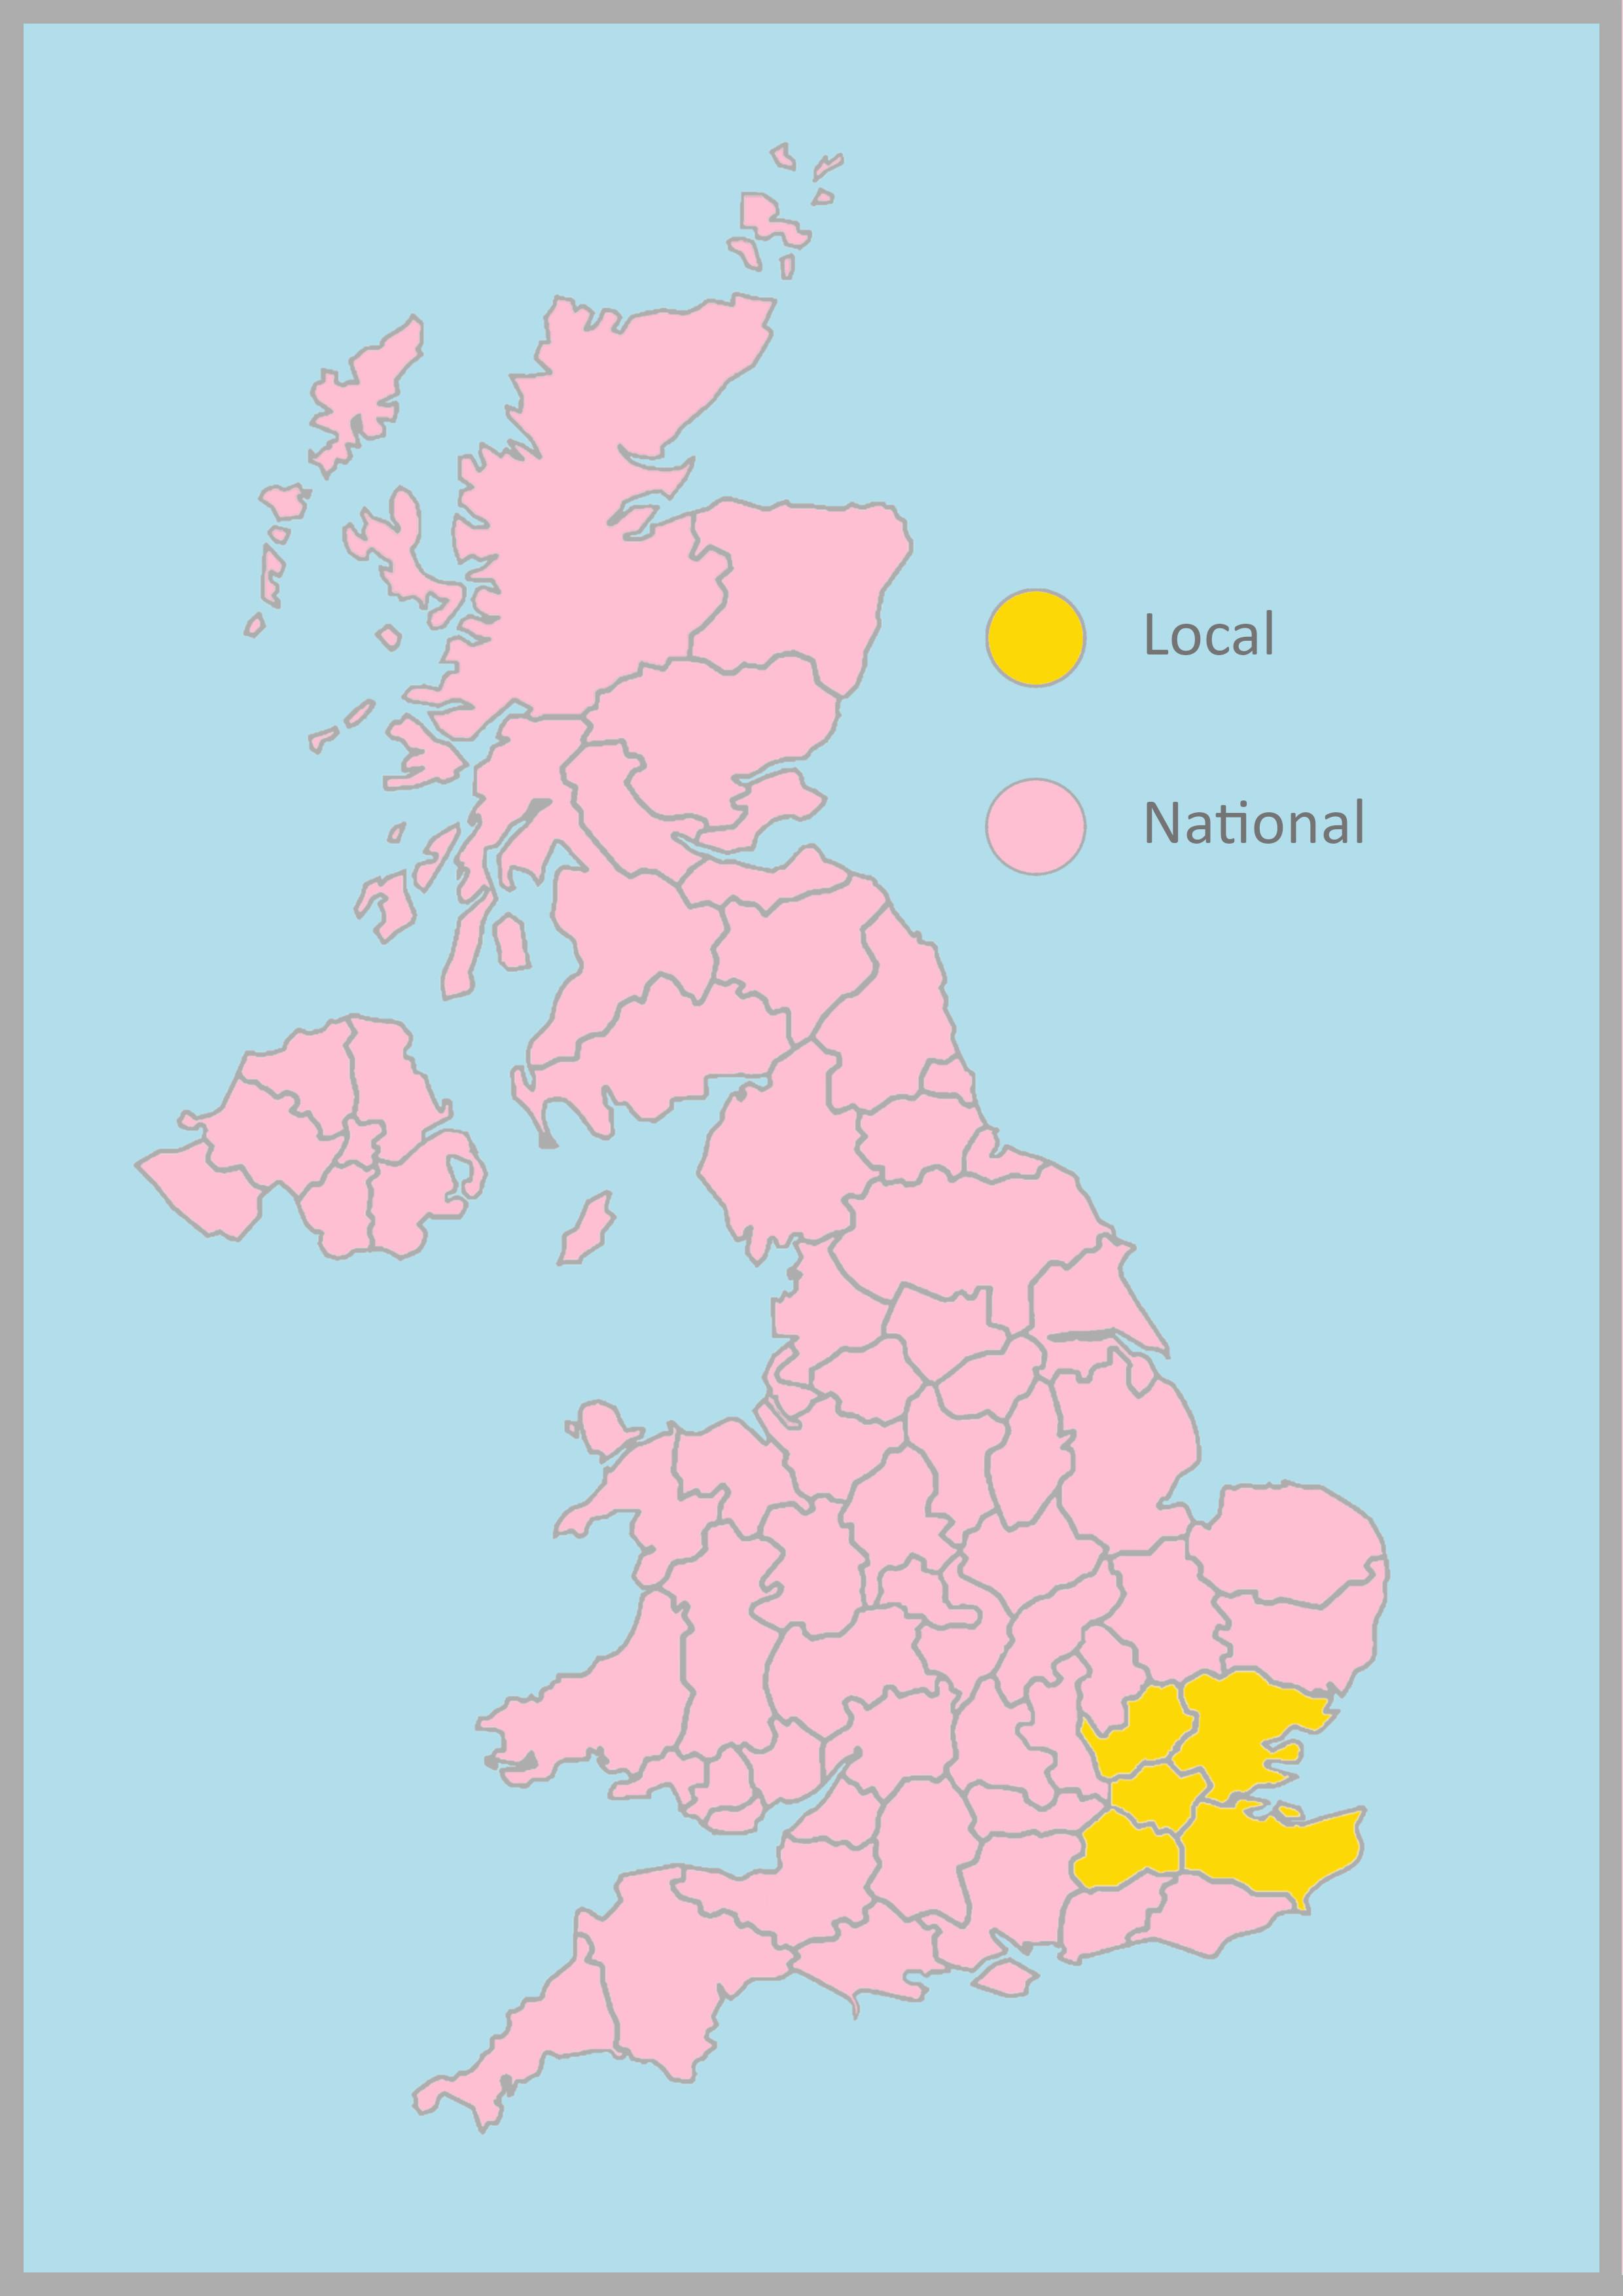 Local National Map.jpg